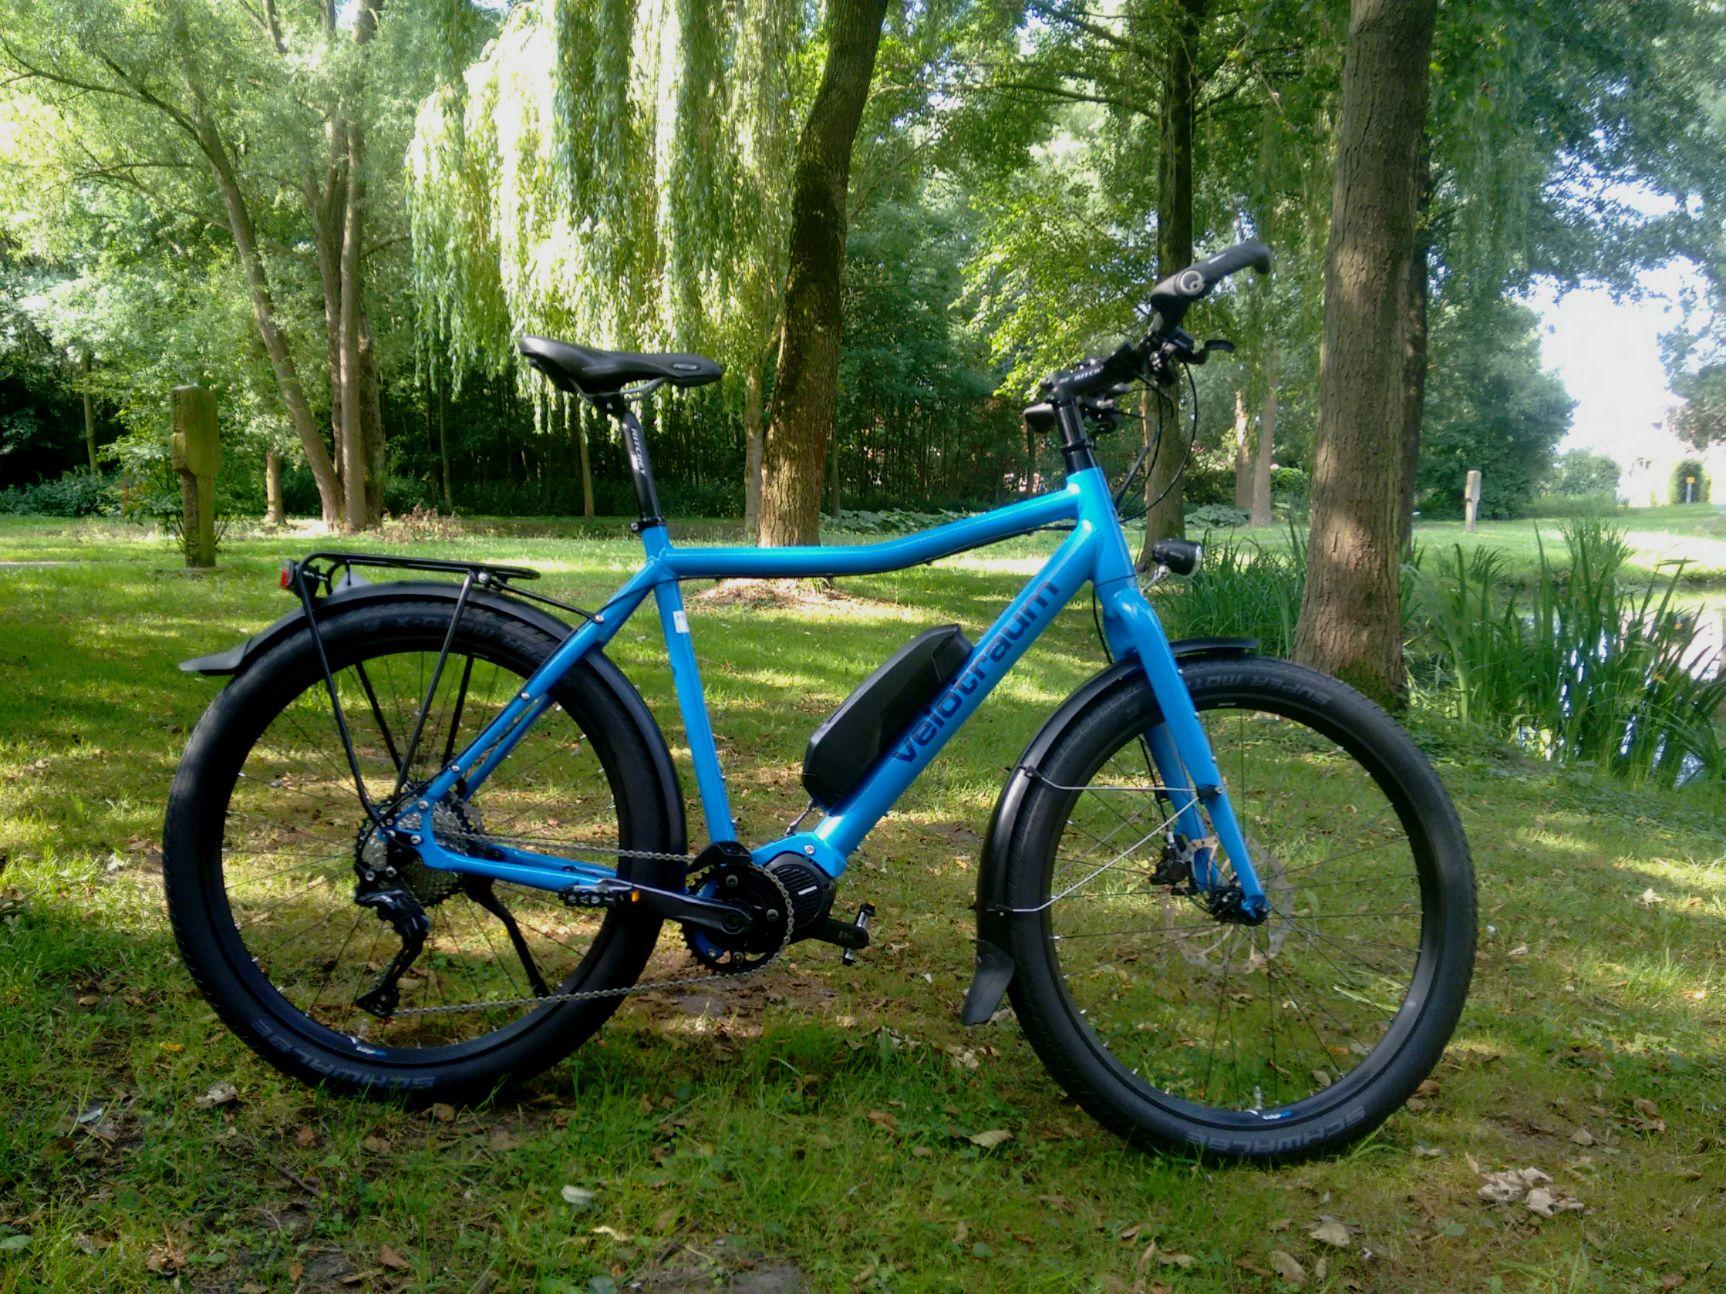 XXL-bikes | Frank Raußen